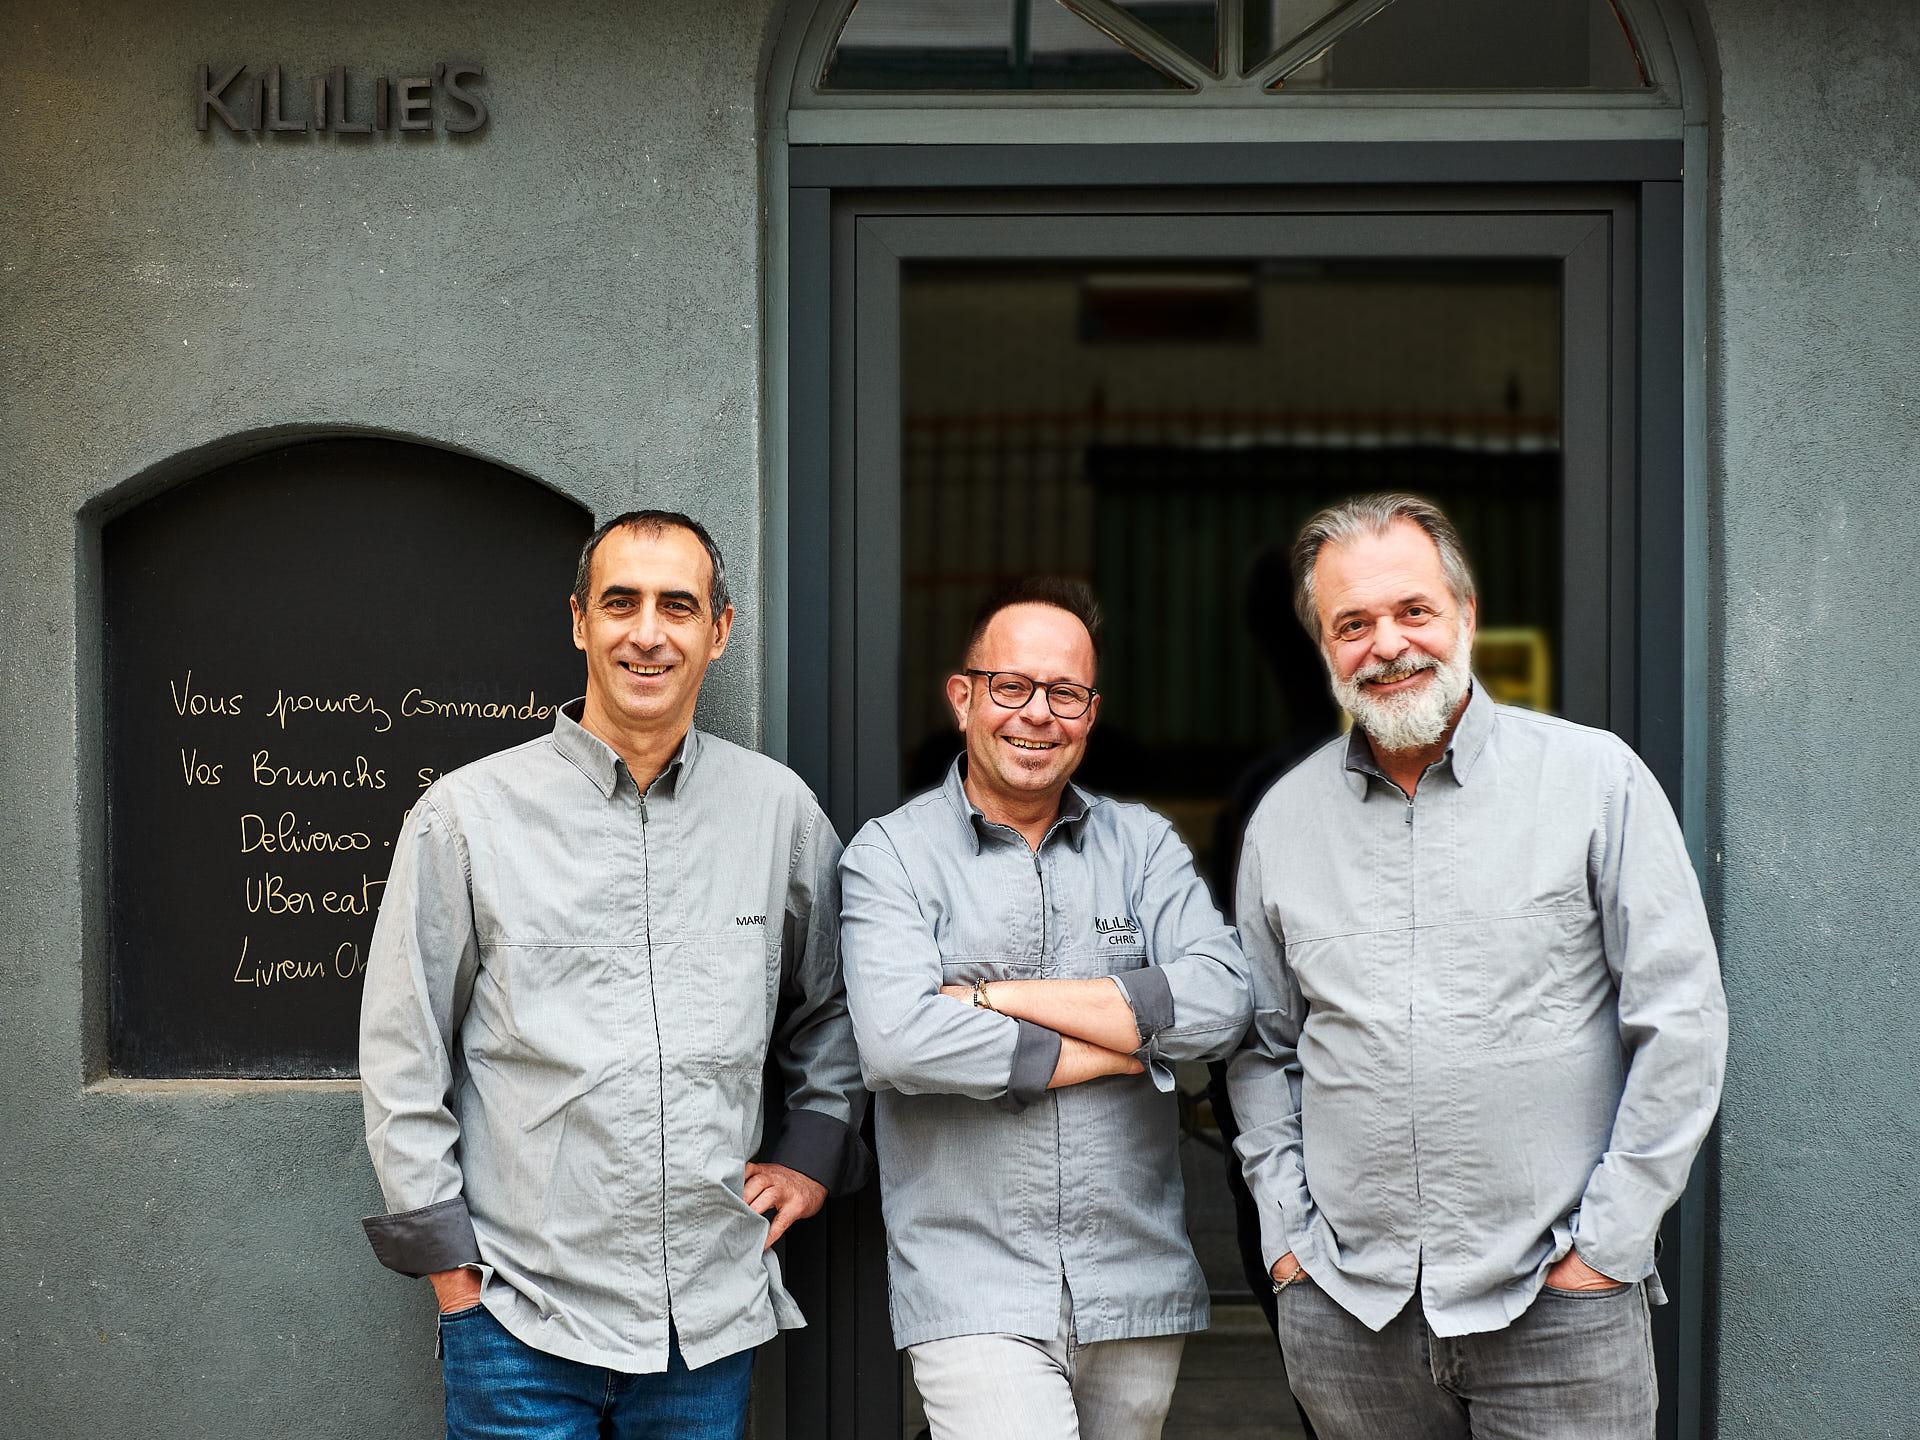 Staff Kililie's